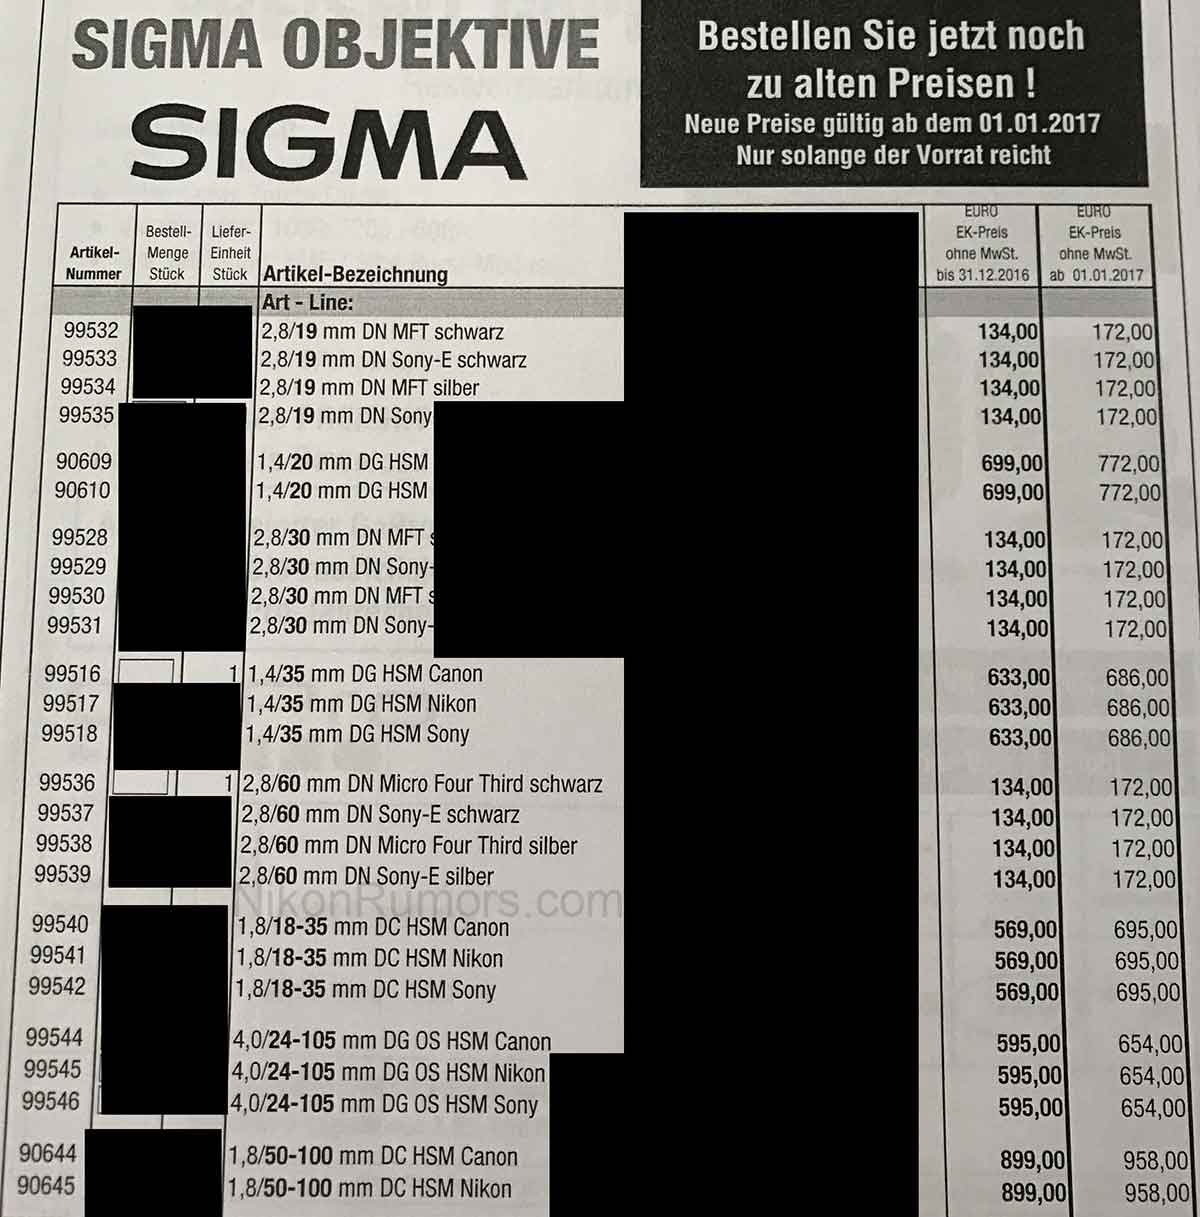 sigma-preiserhoehung